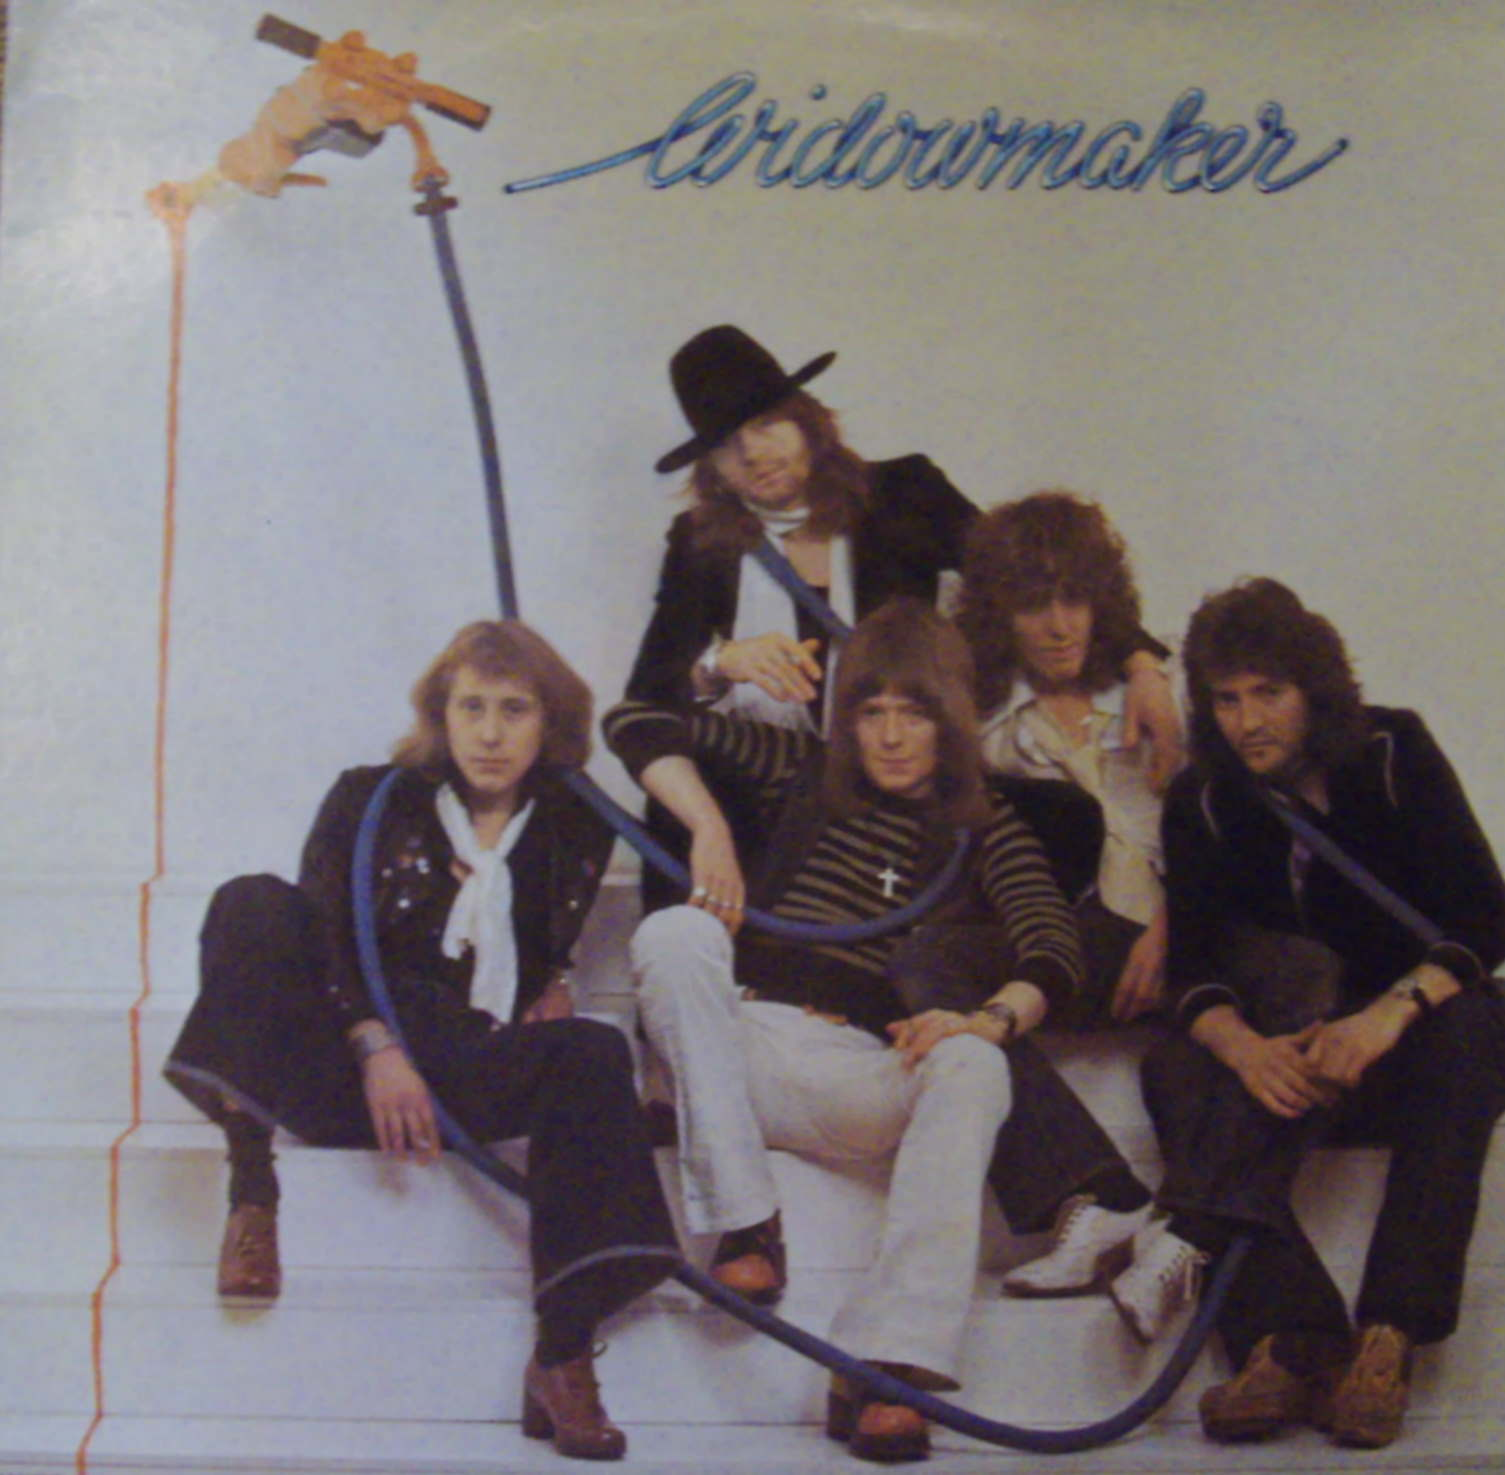 Widowmaker Widowmaker Vinyl